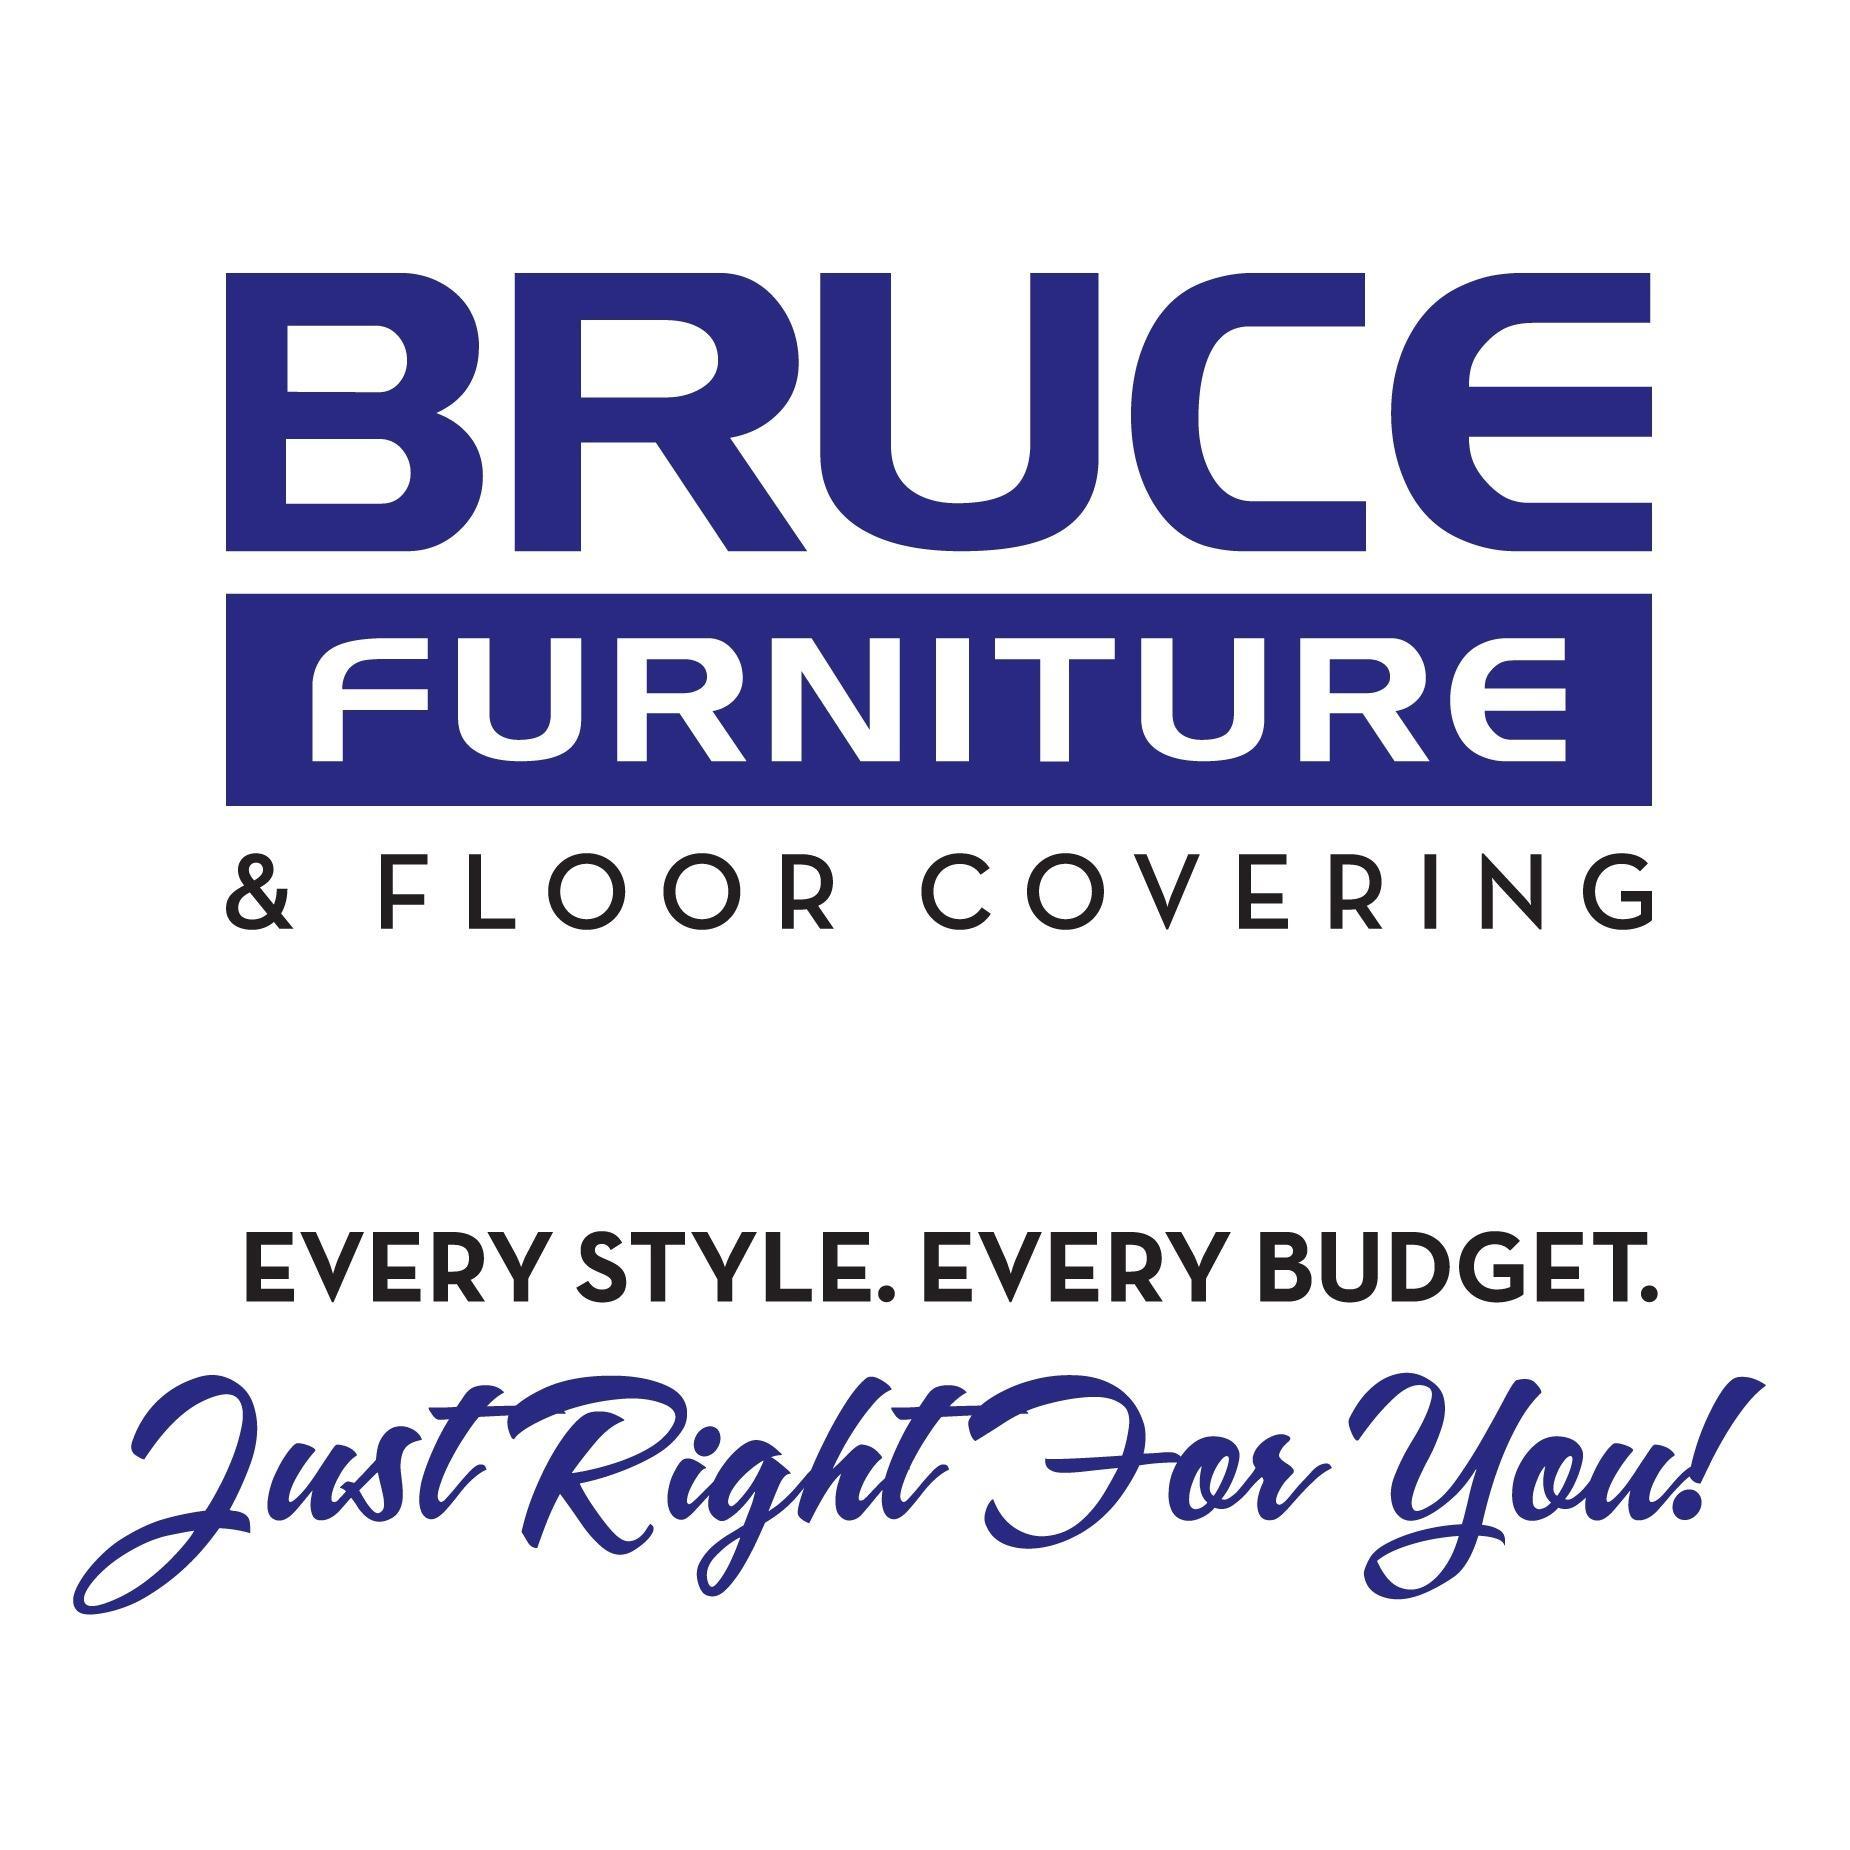 Bruce Furniture & Floor Covering